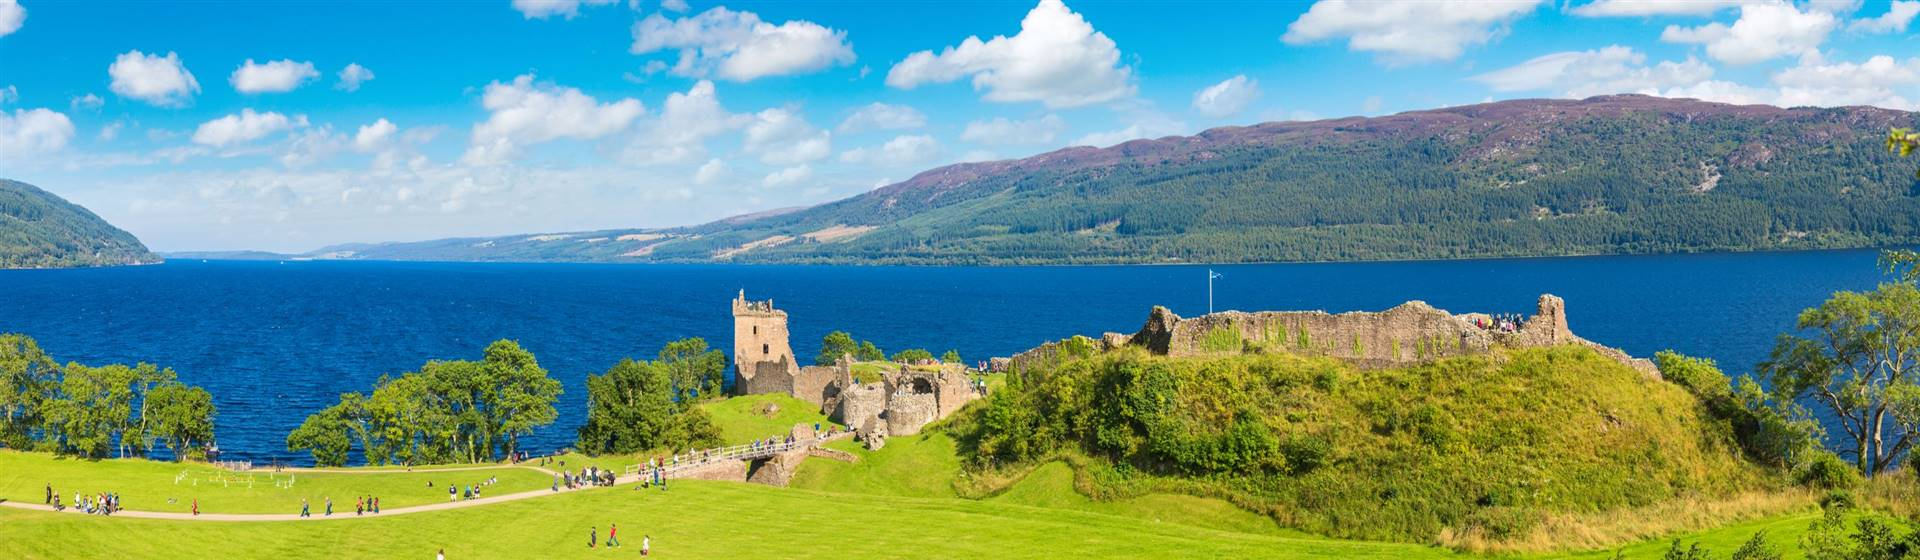 "<img src=""urquartcastle&lochness-shutterstockLR.jpeg"" alt=""Urquart Castle and Loch Ness""/>"